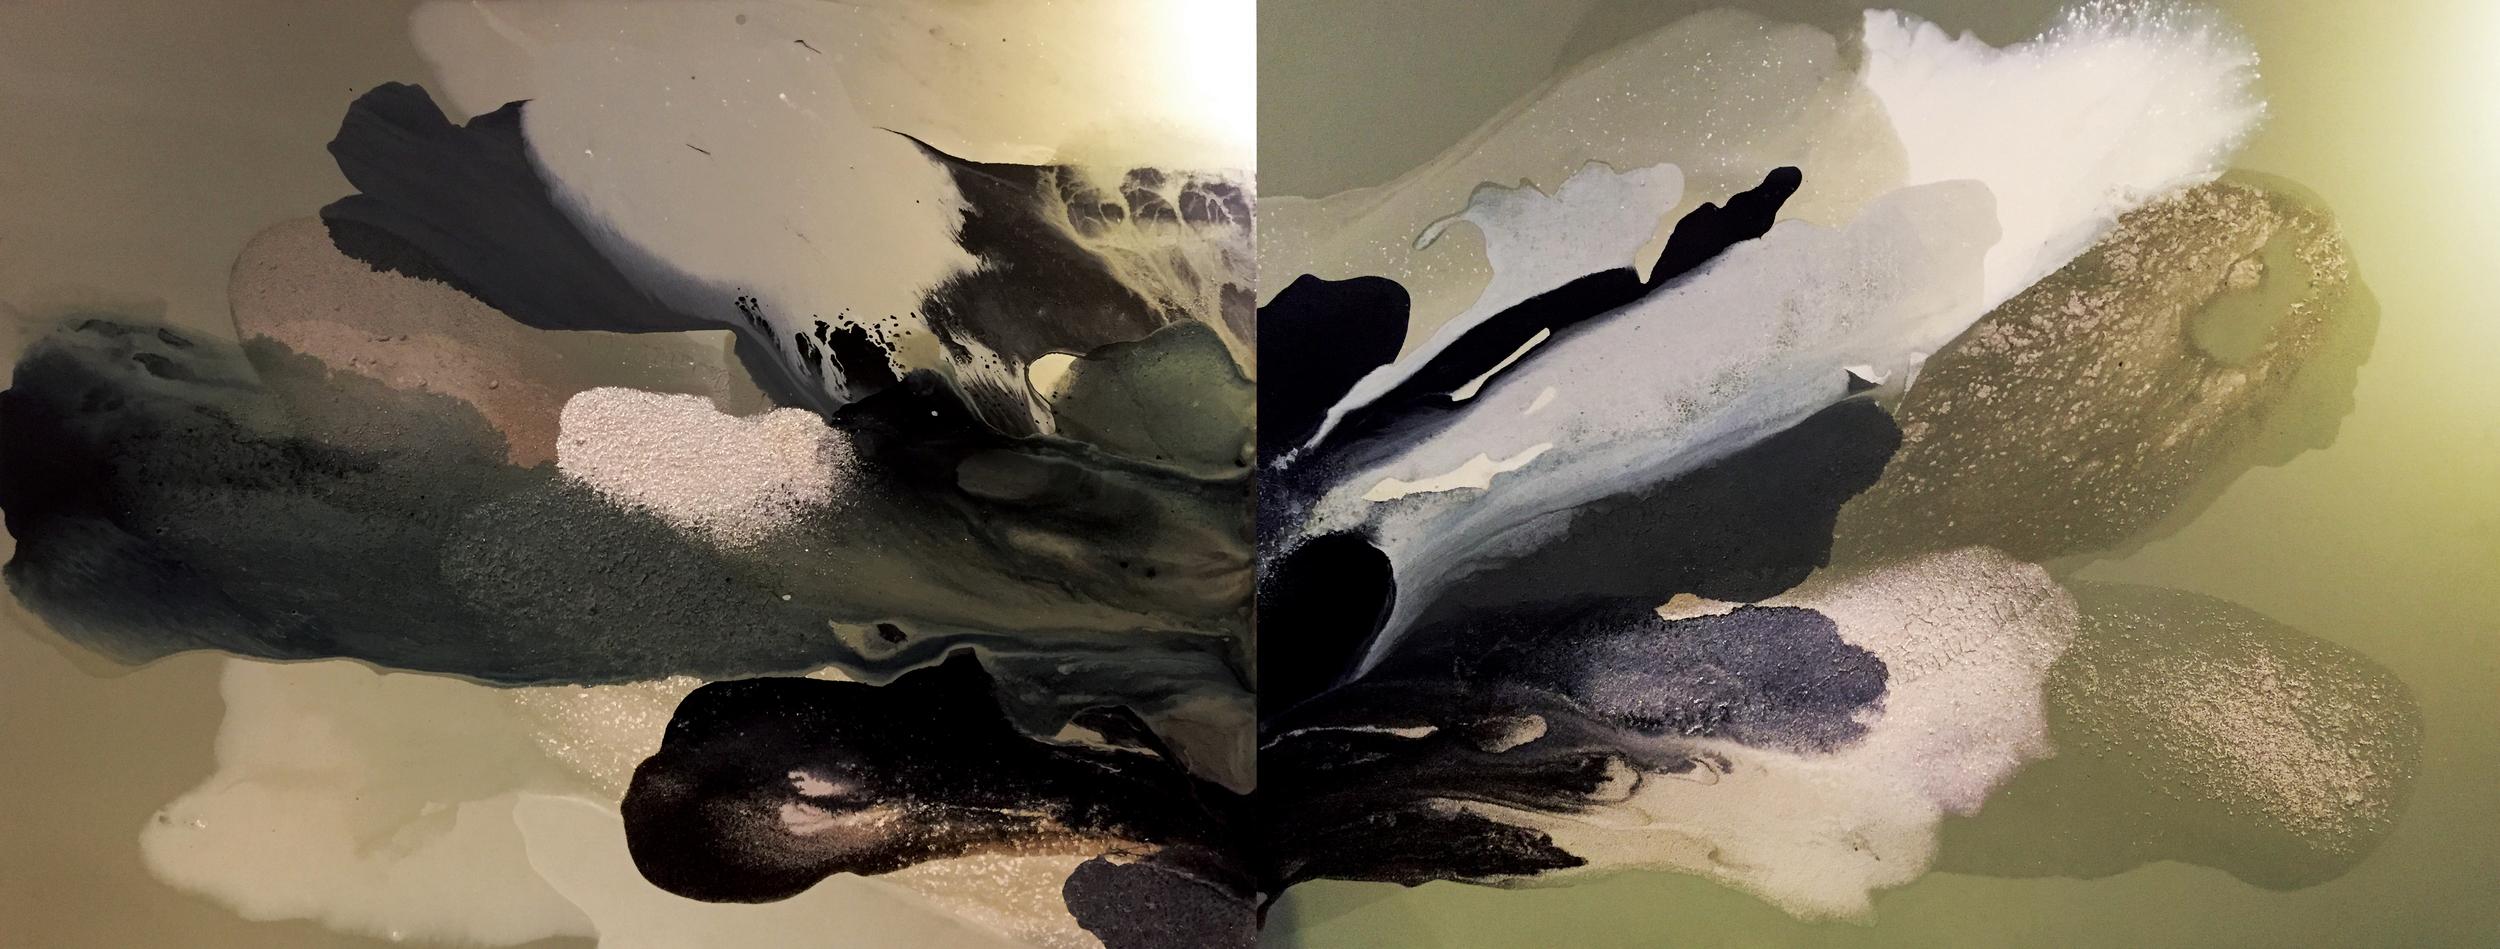 figure_19  acrylic and pumice  gel on canvas  290 cm X 112 cm  2015